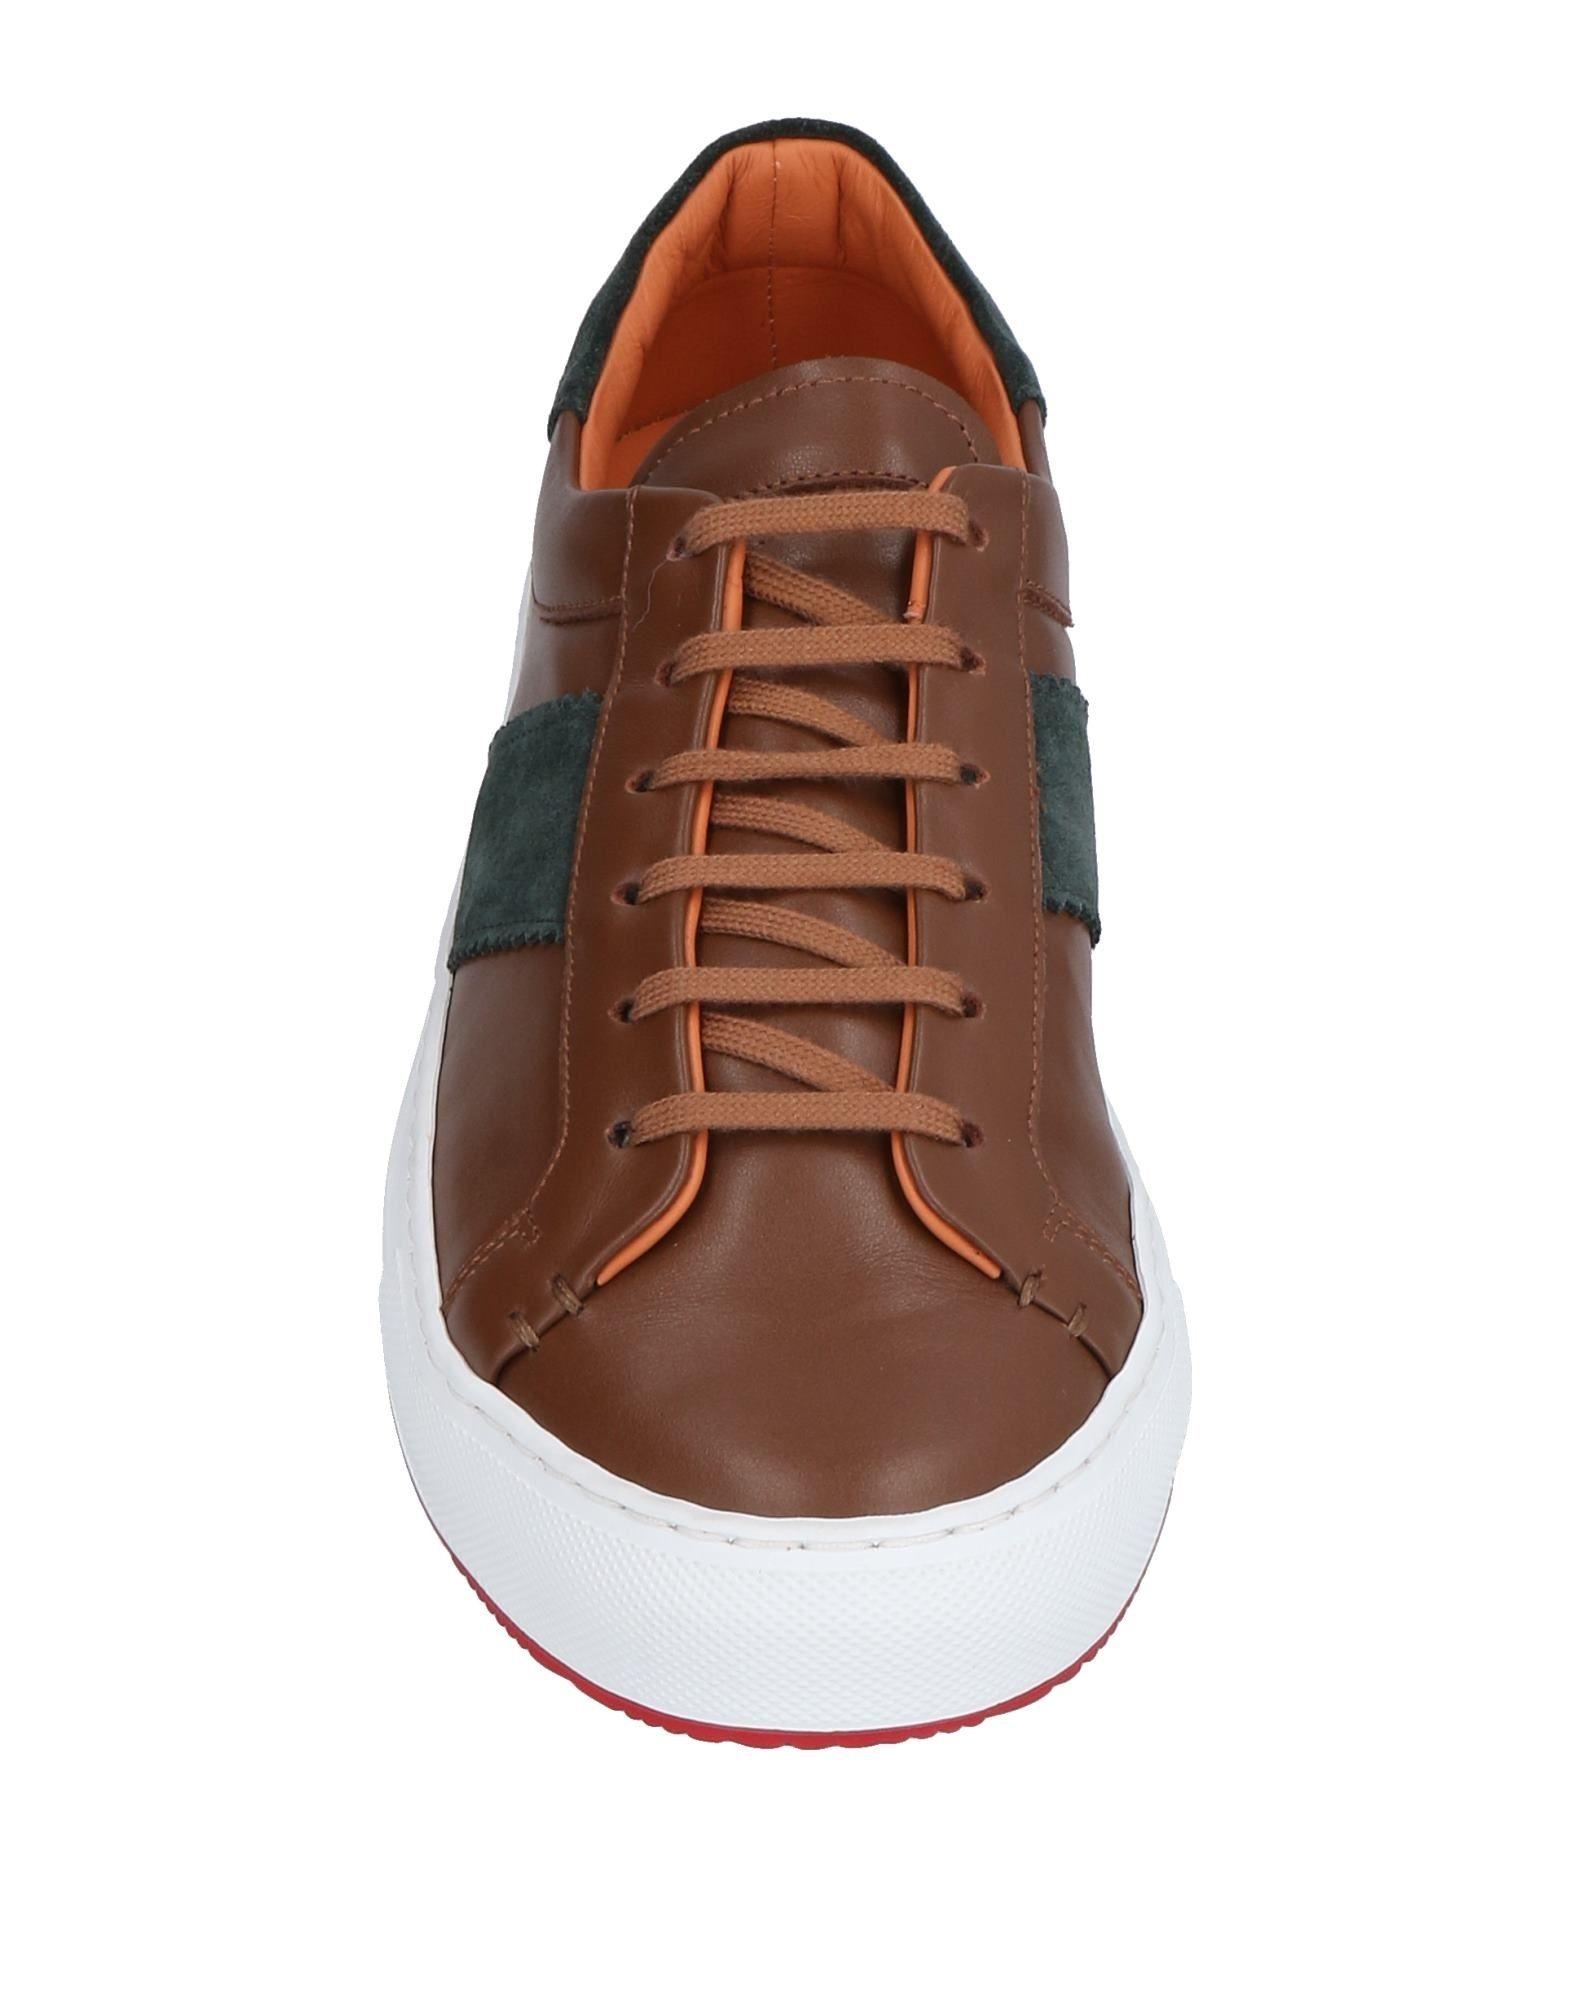 Andrea Ventura Firenze  Sneakers Herren  Firenze 11498016MQ 5a1770